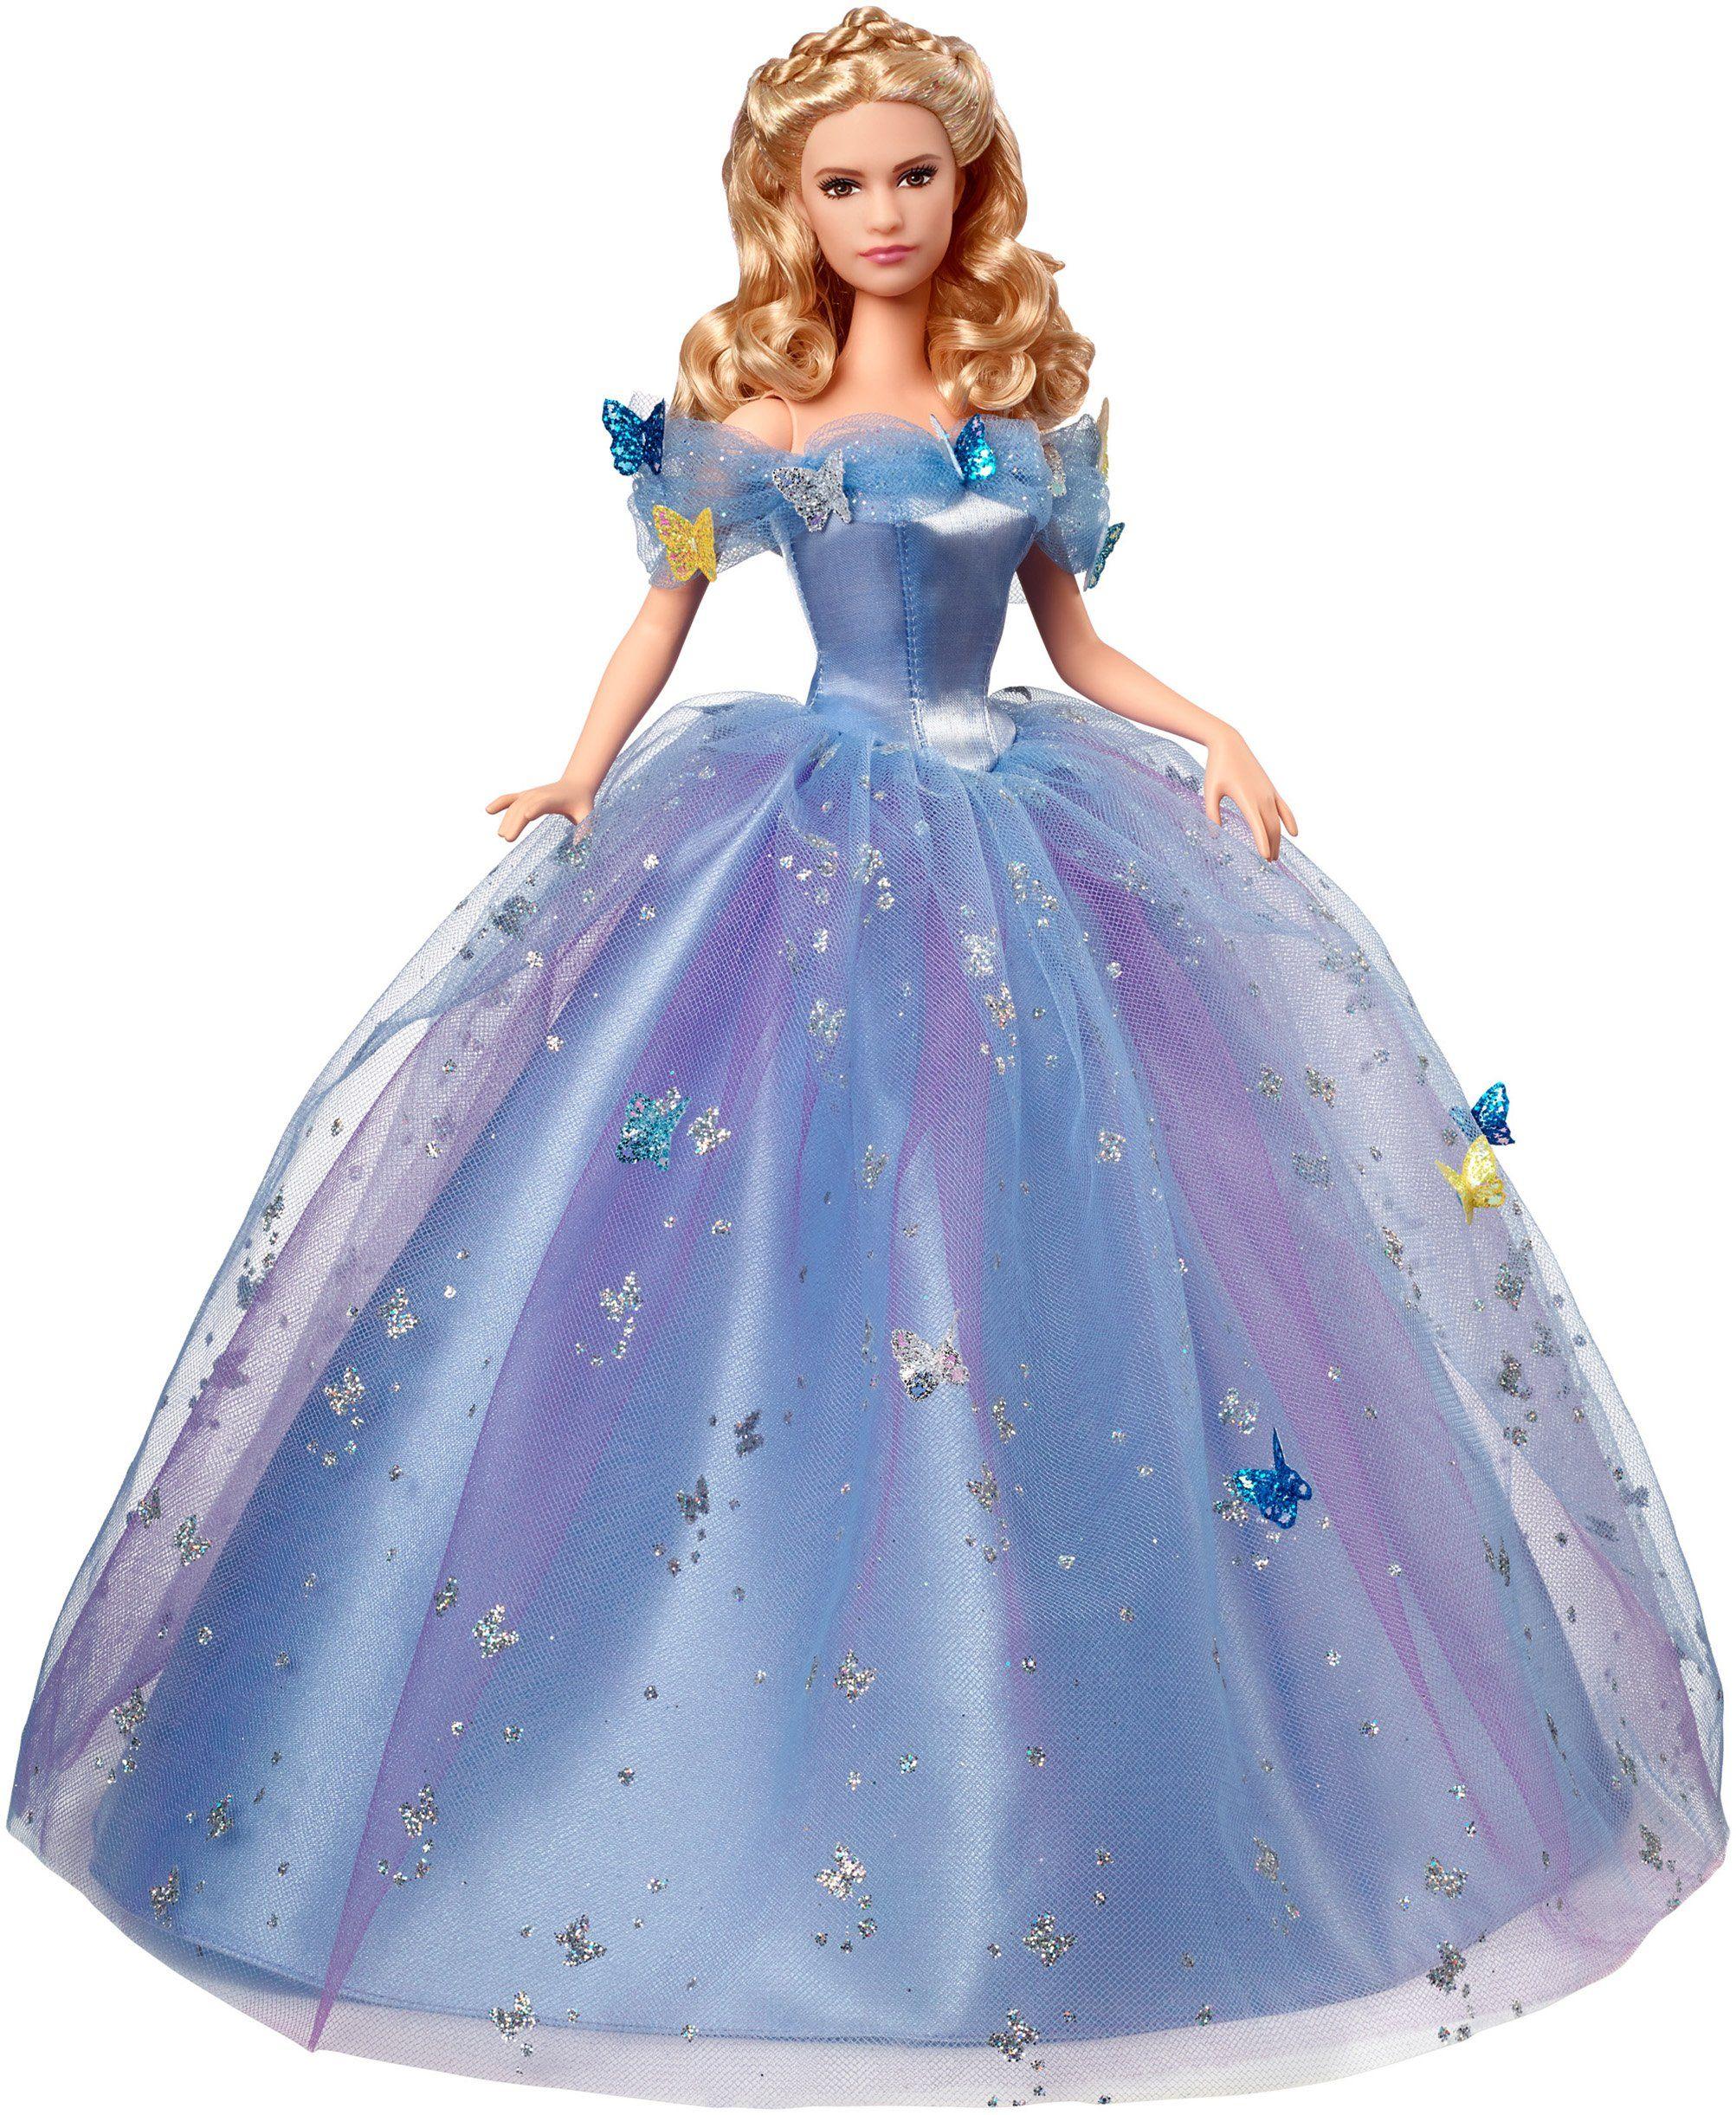 Disney Cinderella Royal Ball Cinderella Doll $30.00 | The Kiddie ...